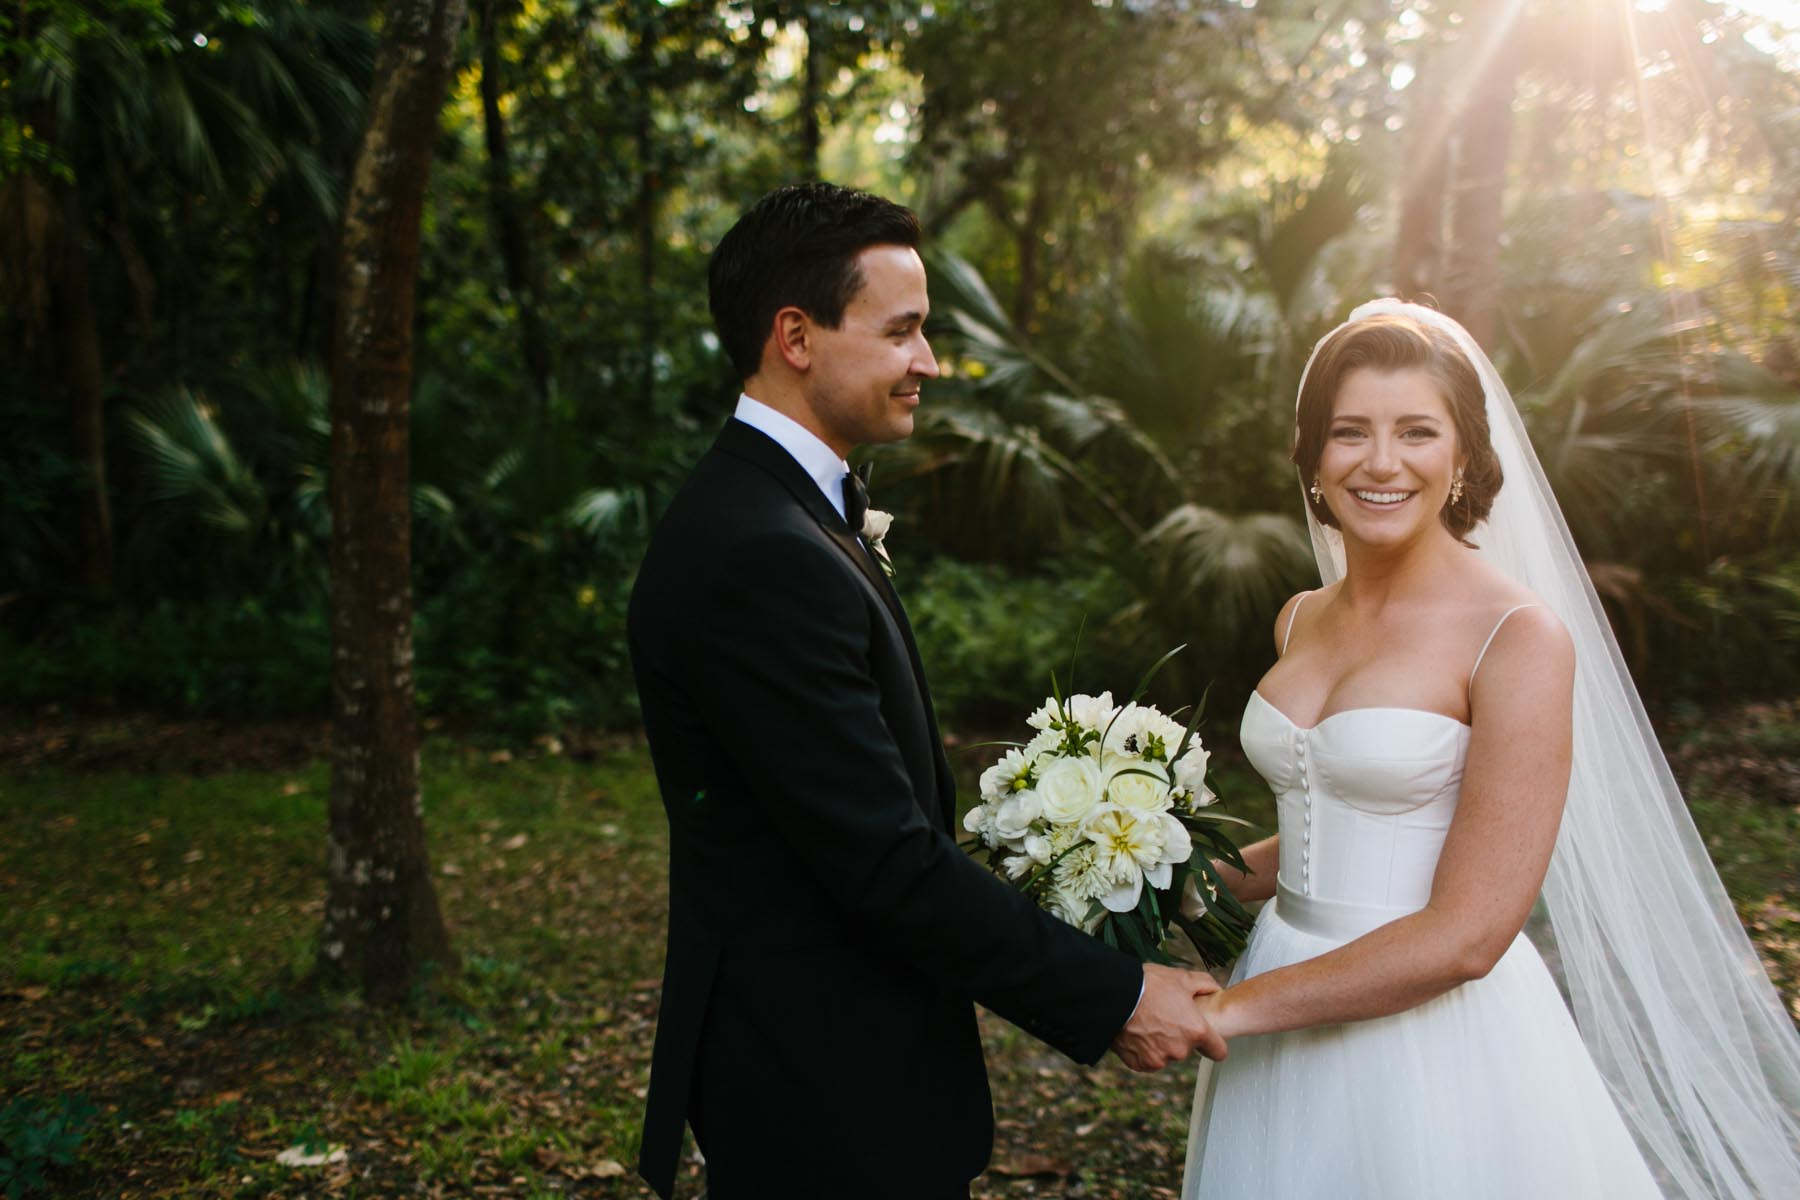 lowry wedding blog eden garden florida wedding-86